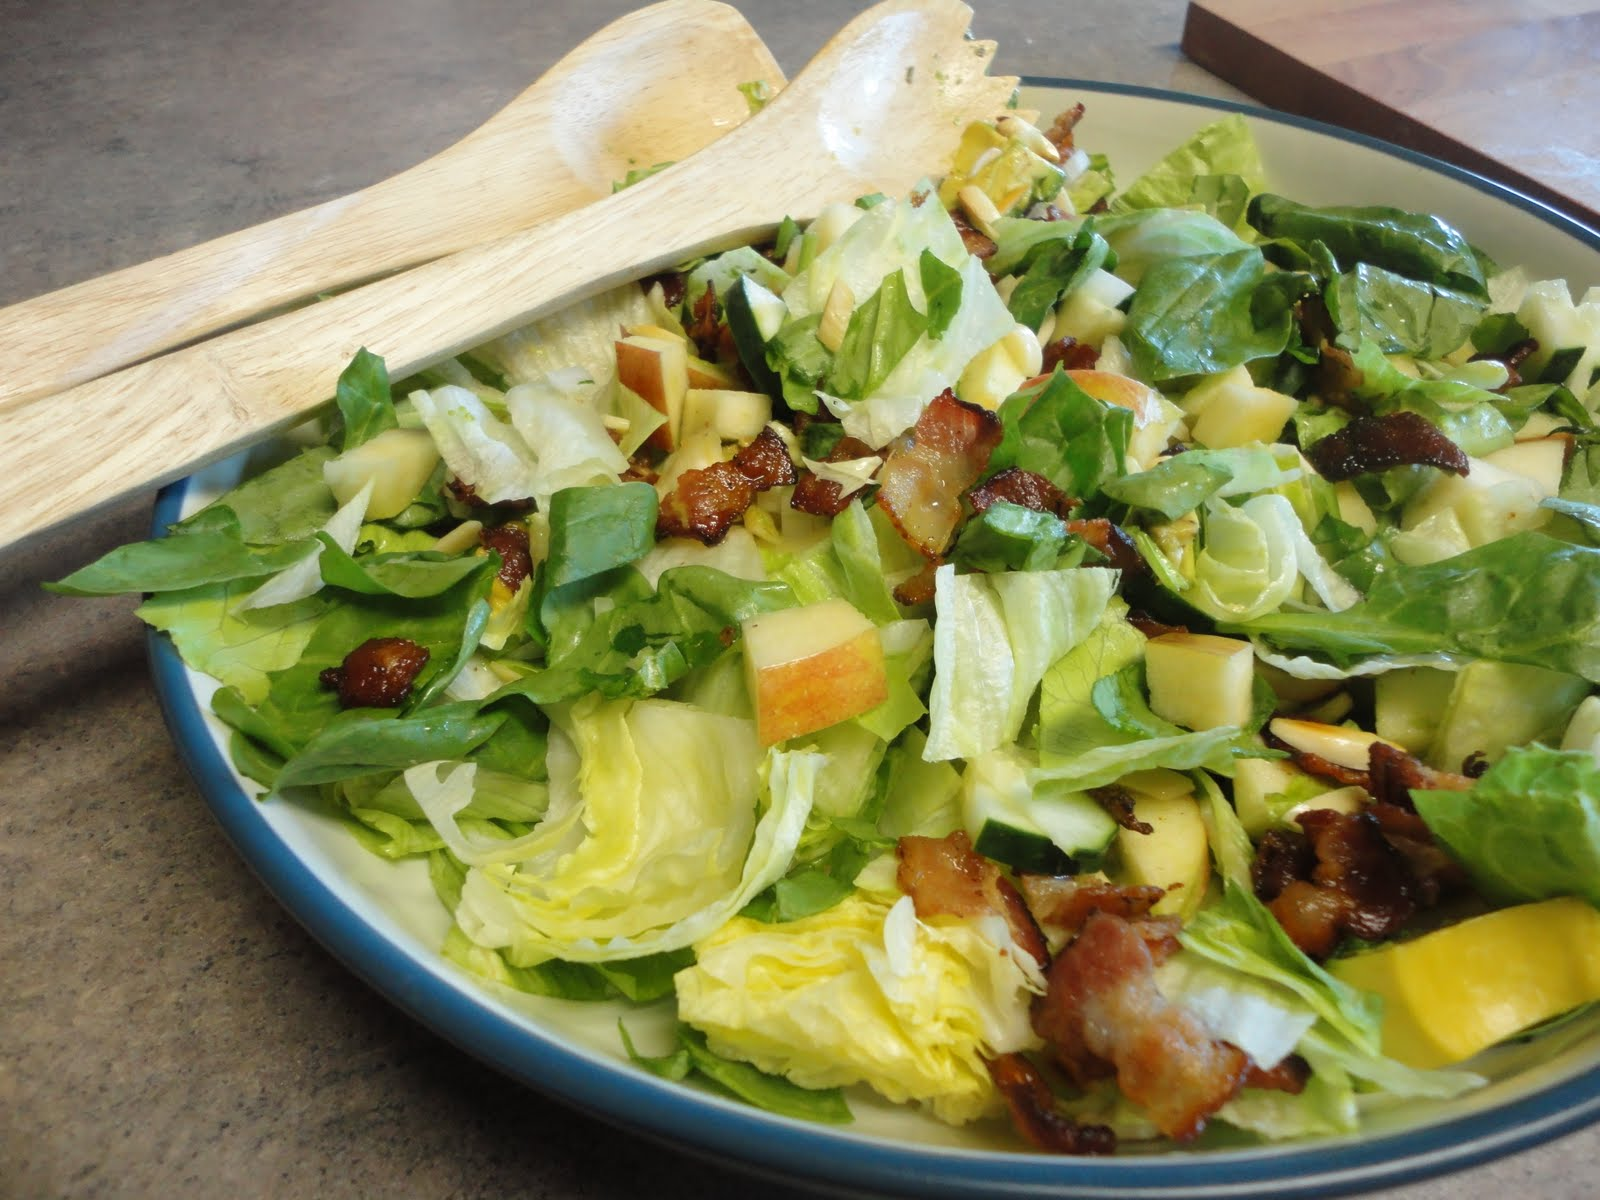 The Frickin Chicken: Apple & Bacon Salad